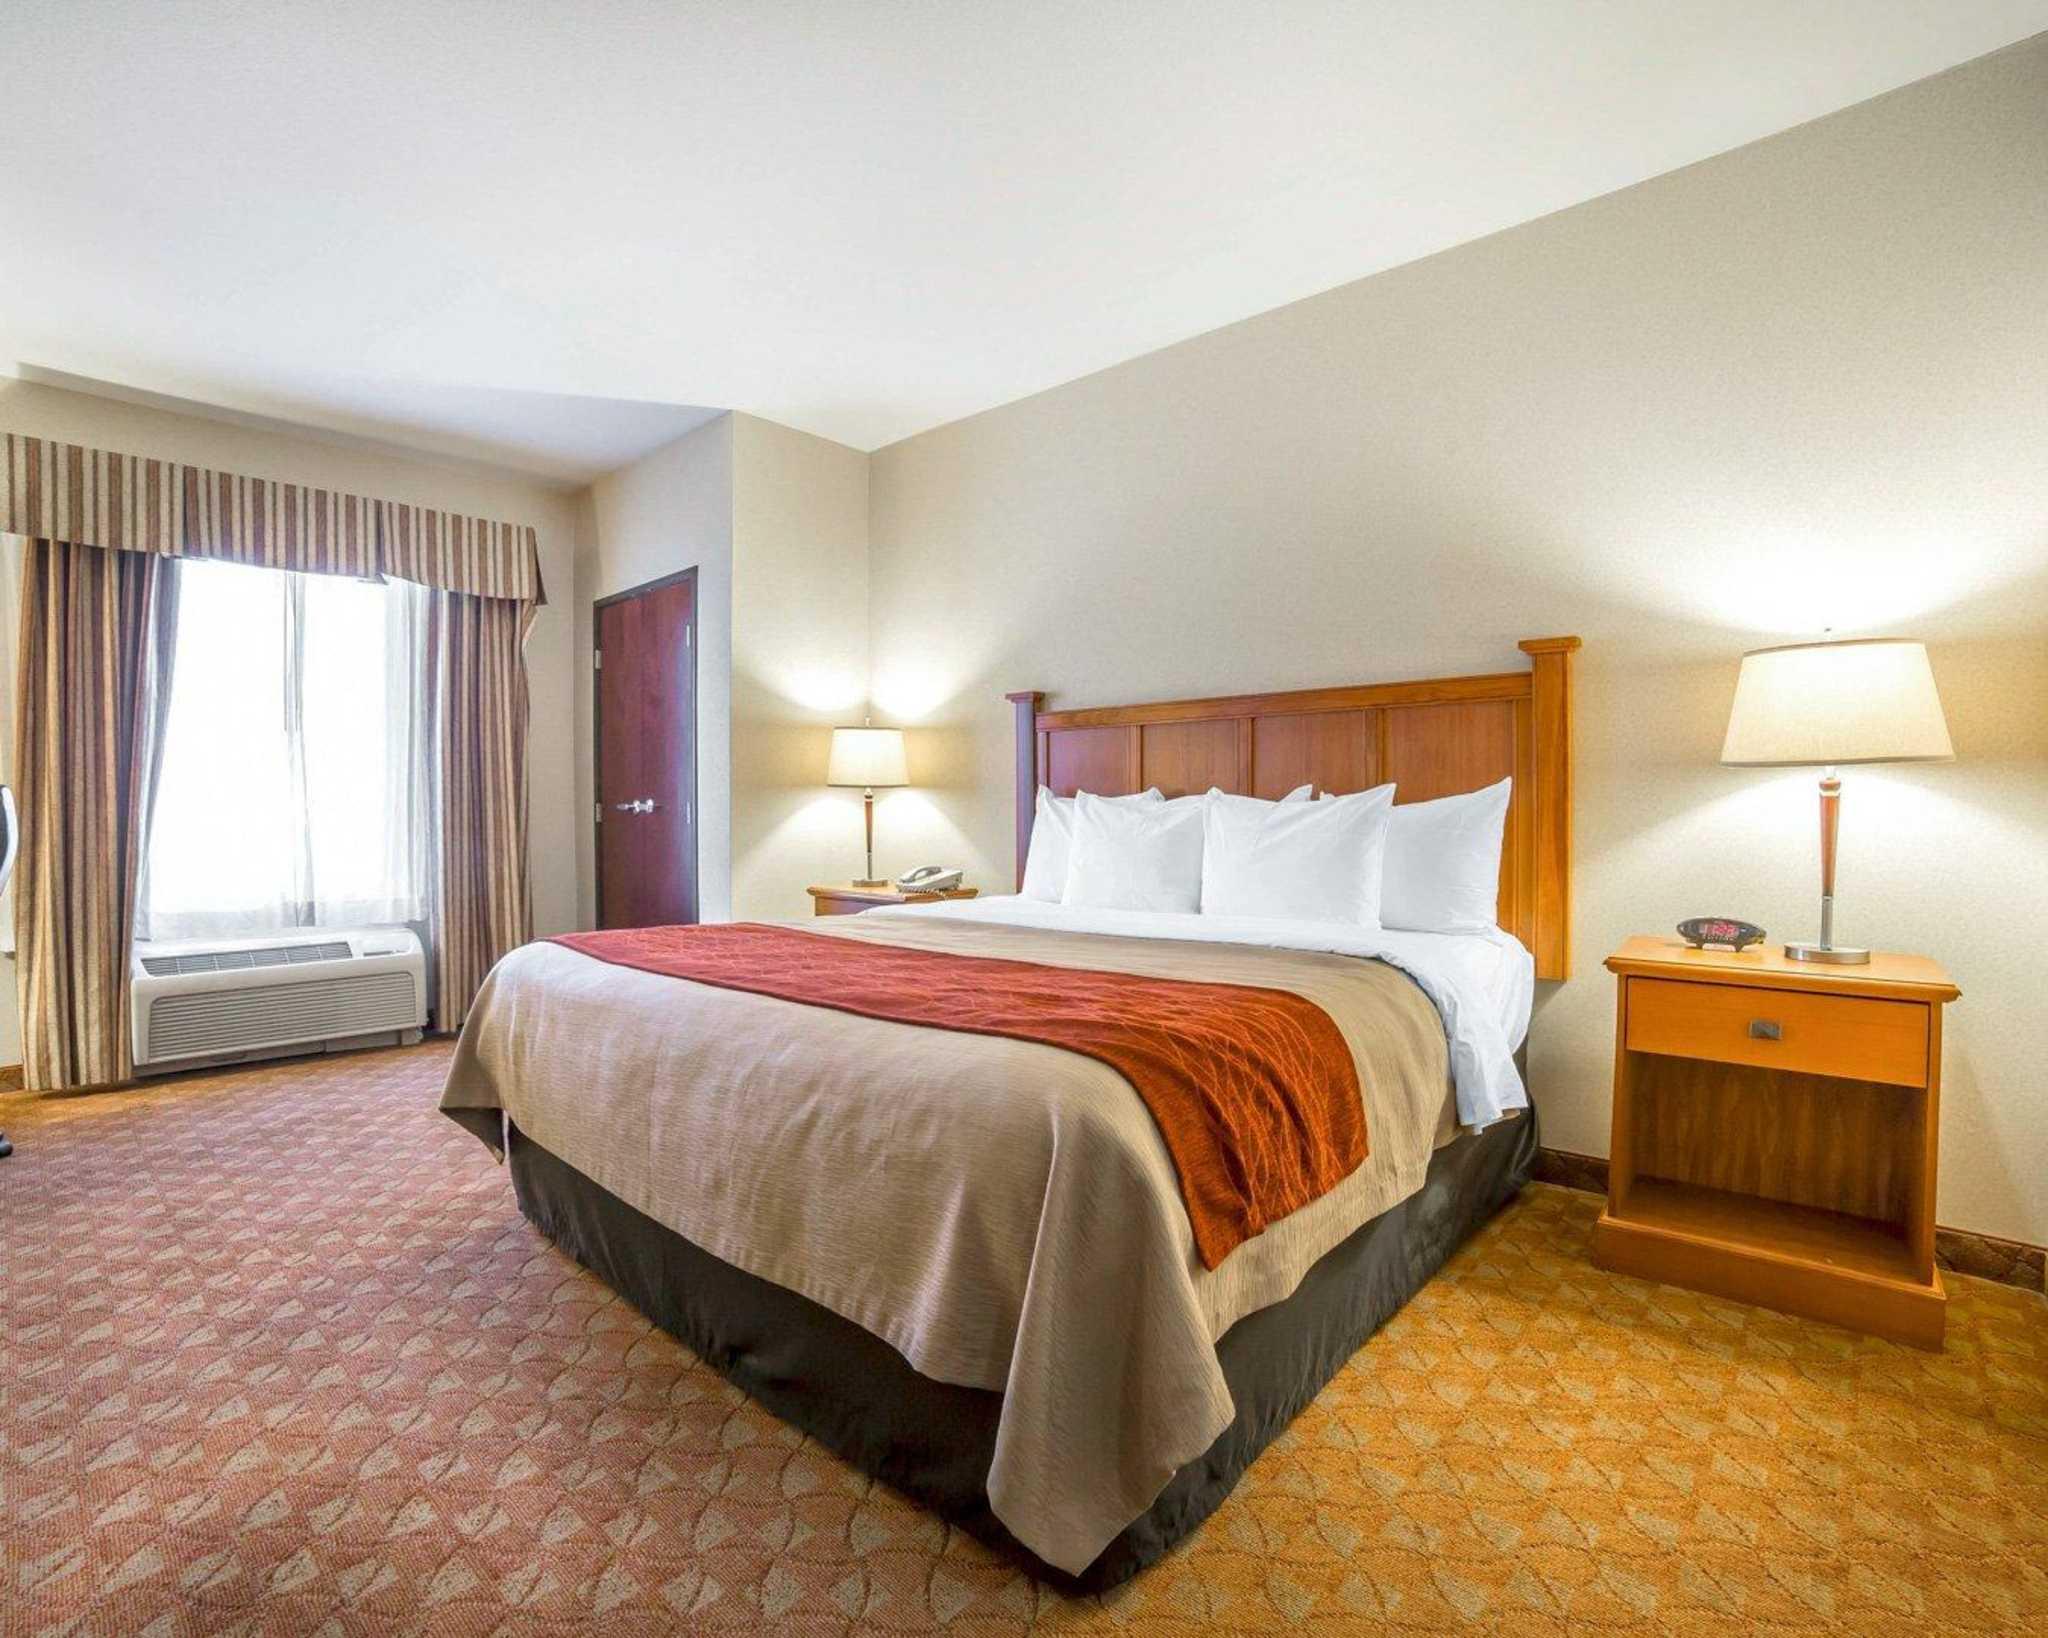 Comfort Inn & Suites Las Vegas - Nellis image 7